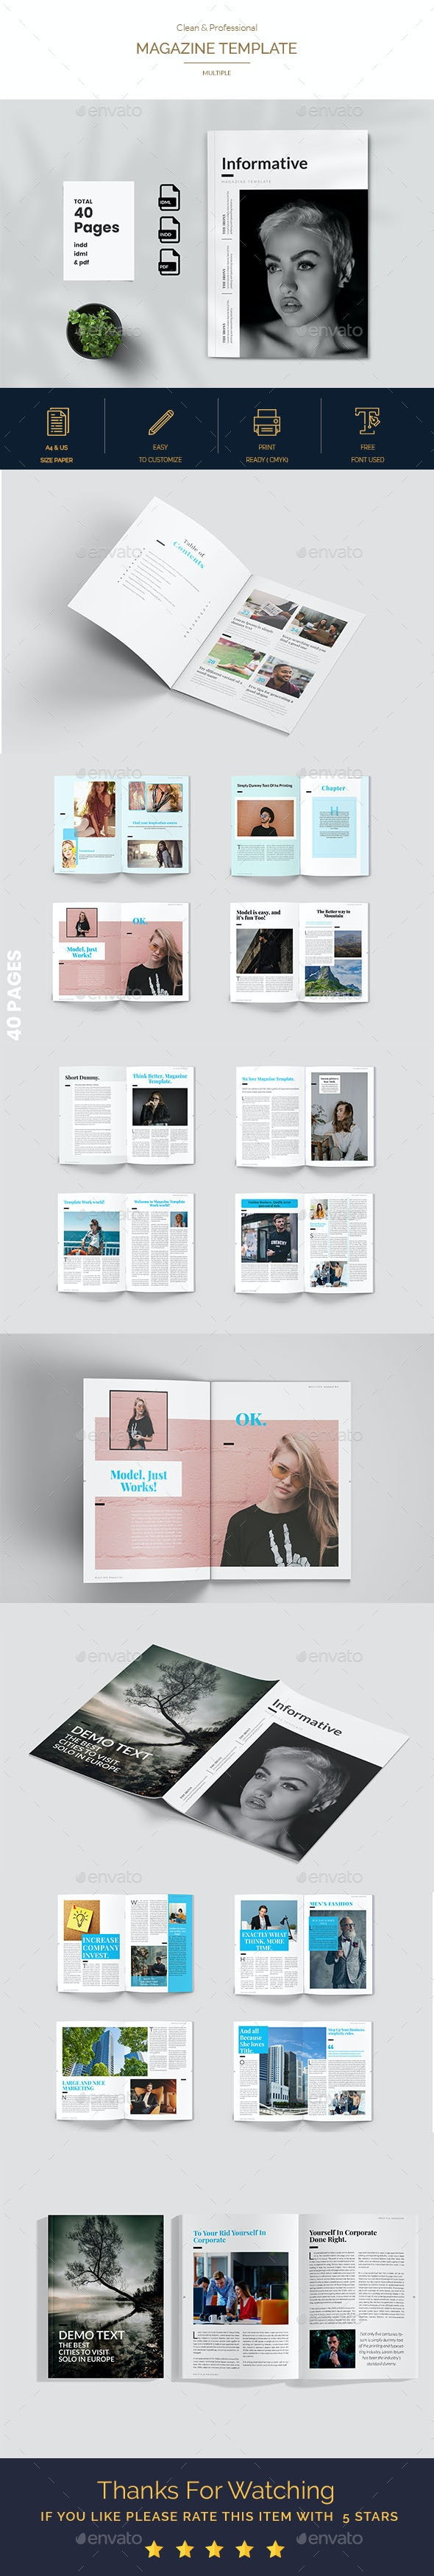 Informative Magazine Template - Magazines Print Templates